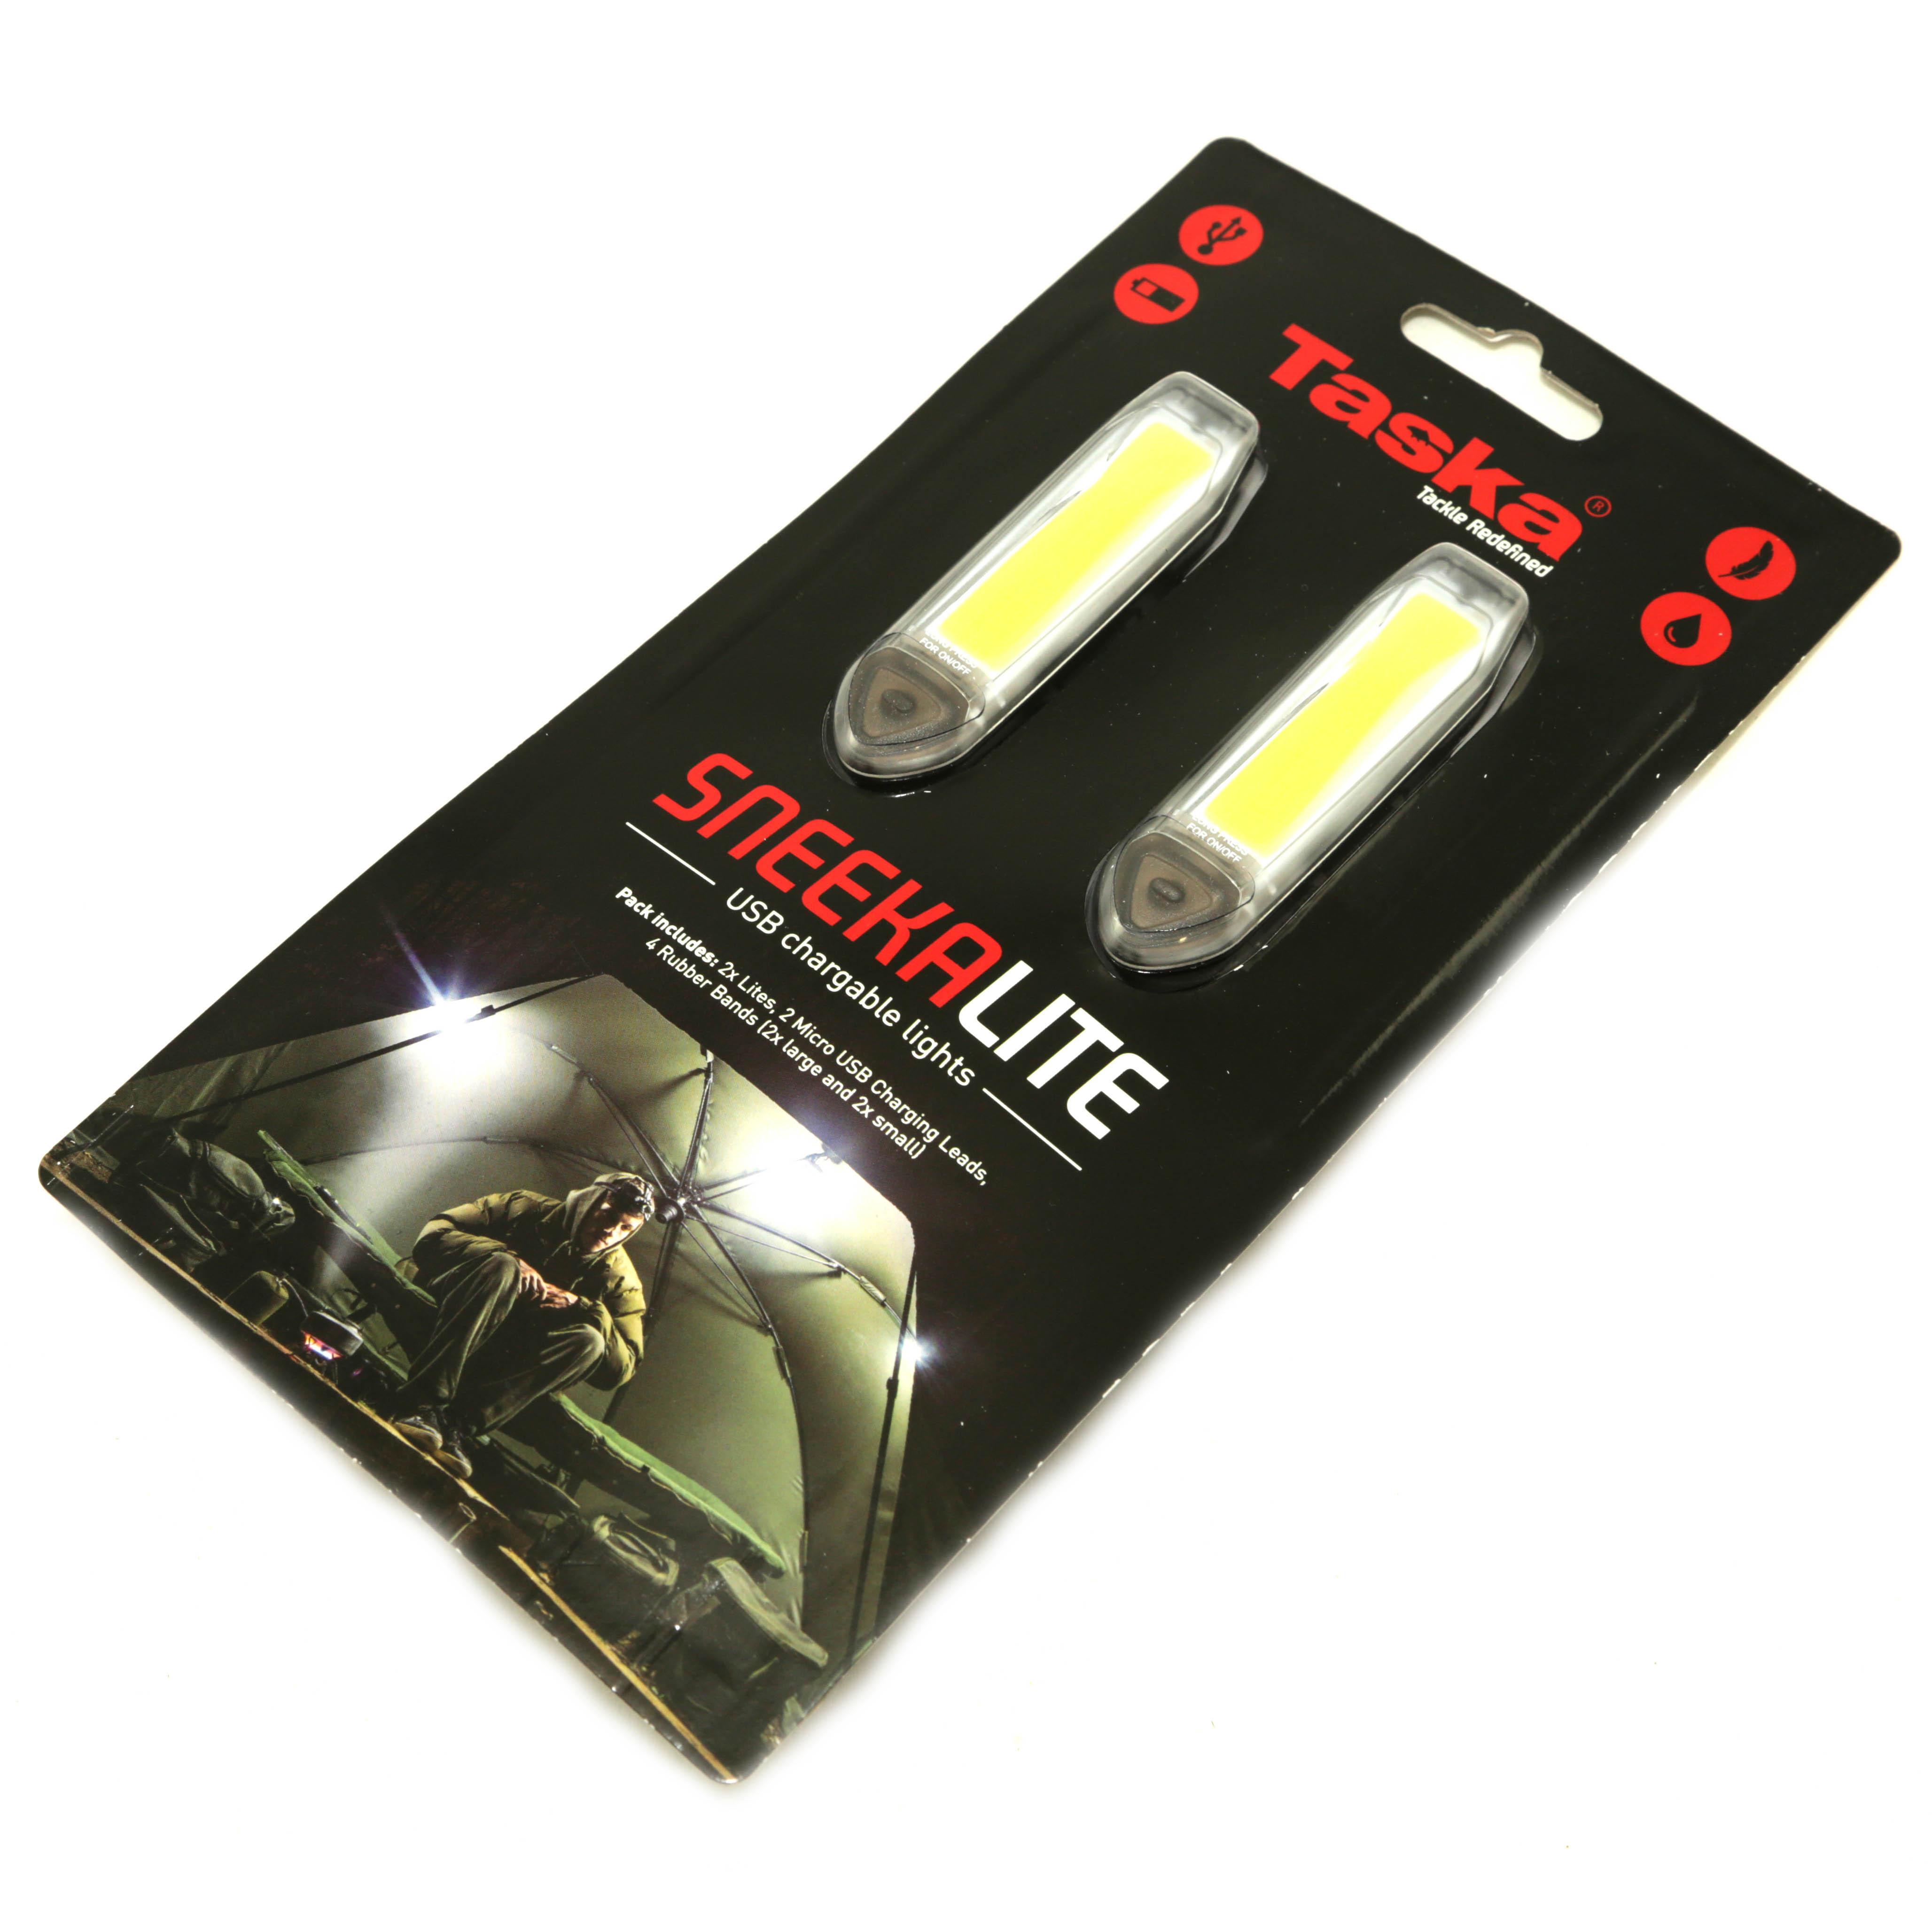 Taska- Sneeka Lite kompaktní USB světla do bivaku 2ks